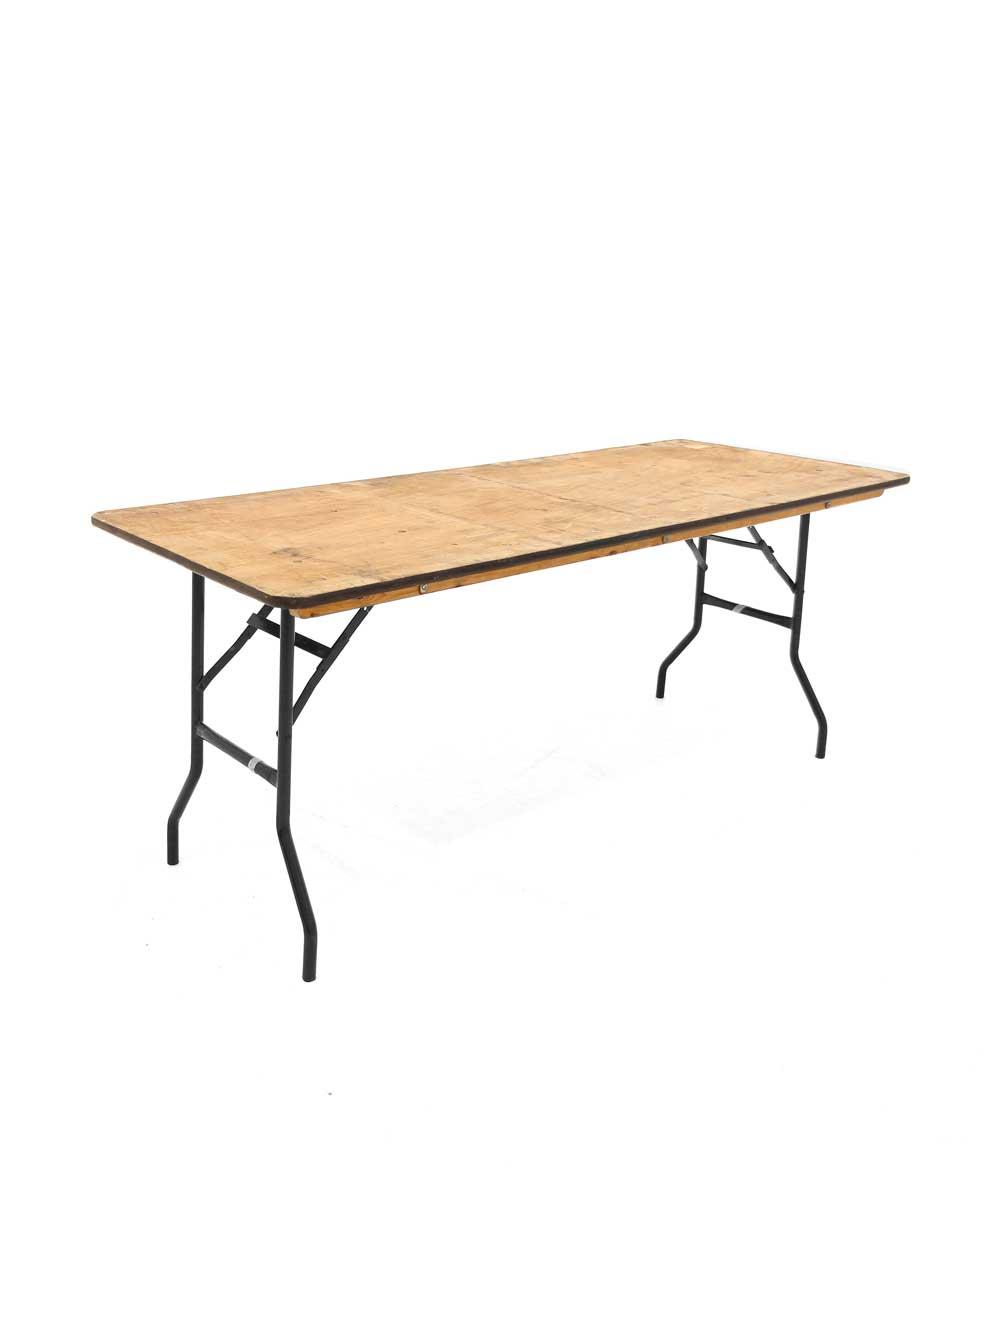 Astounding Folding Trestle Table 6Ft X 2Ft 6 Spiritservingveterans Wood Chair Design Ideas Spiritservingveteransorg